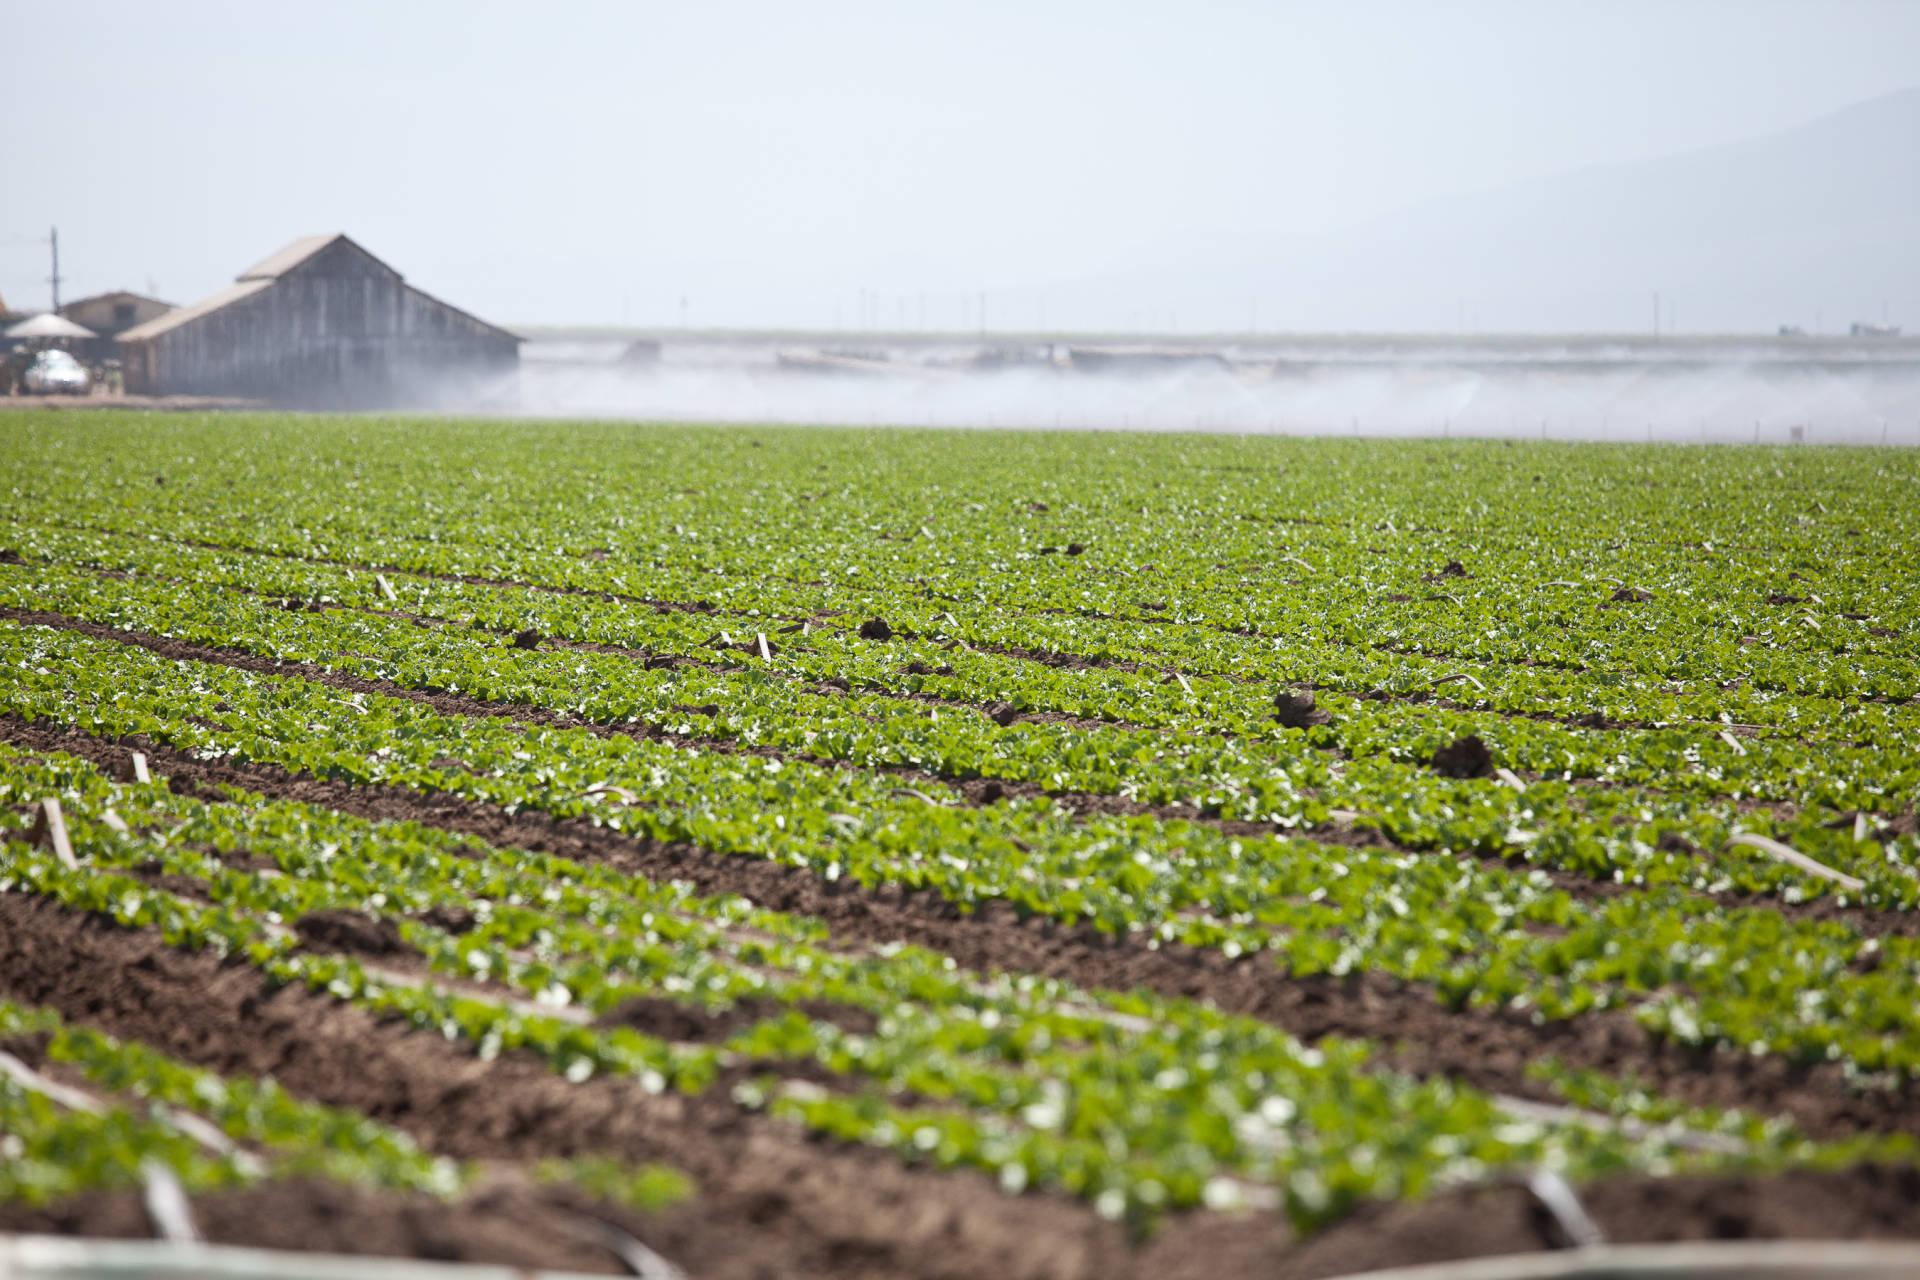 Farm fields in Salinas.